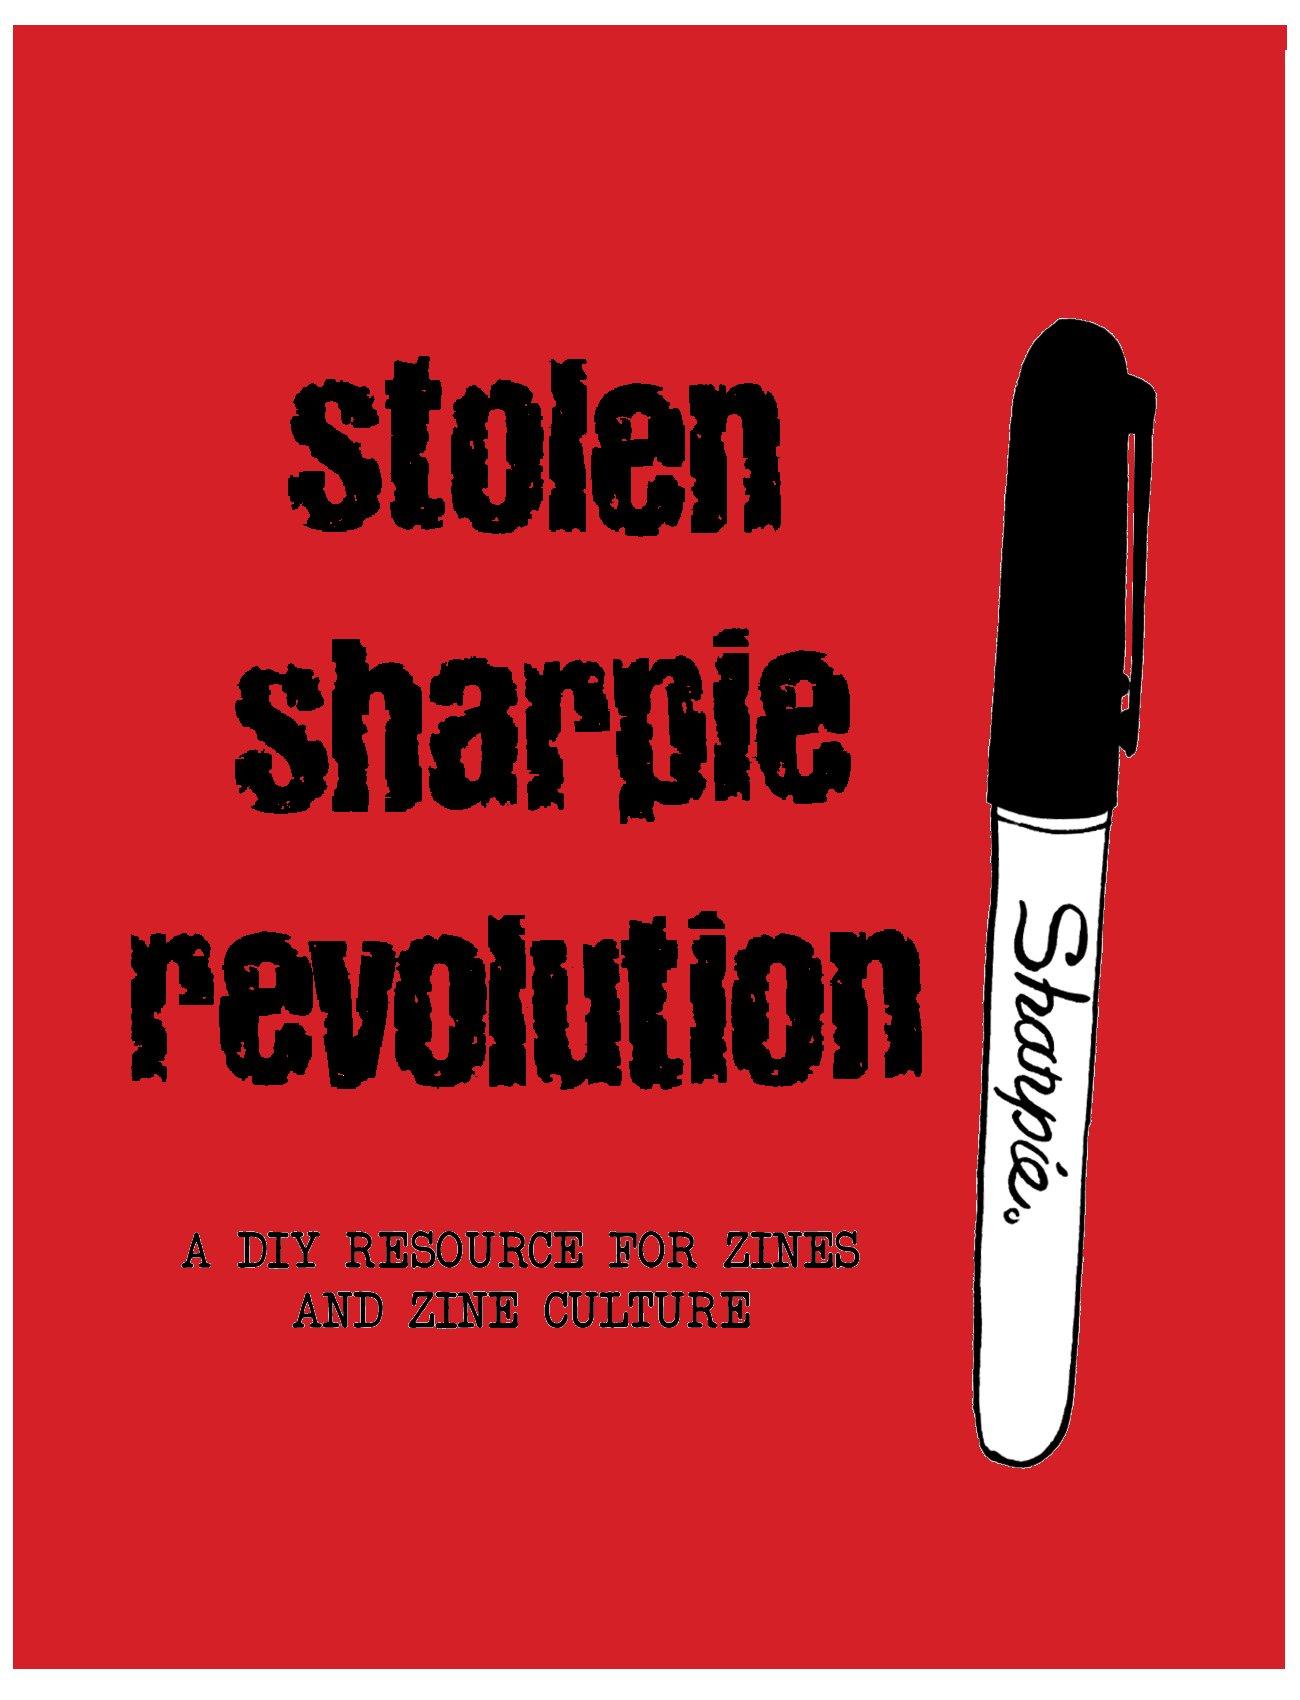 Stolen Sharpie Revolution Resource Culture product image